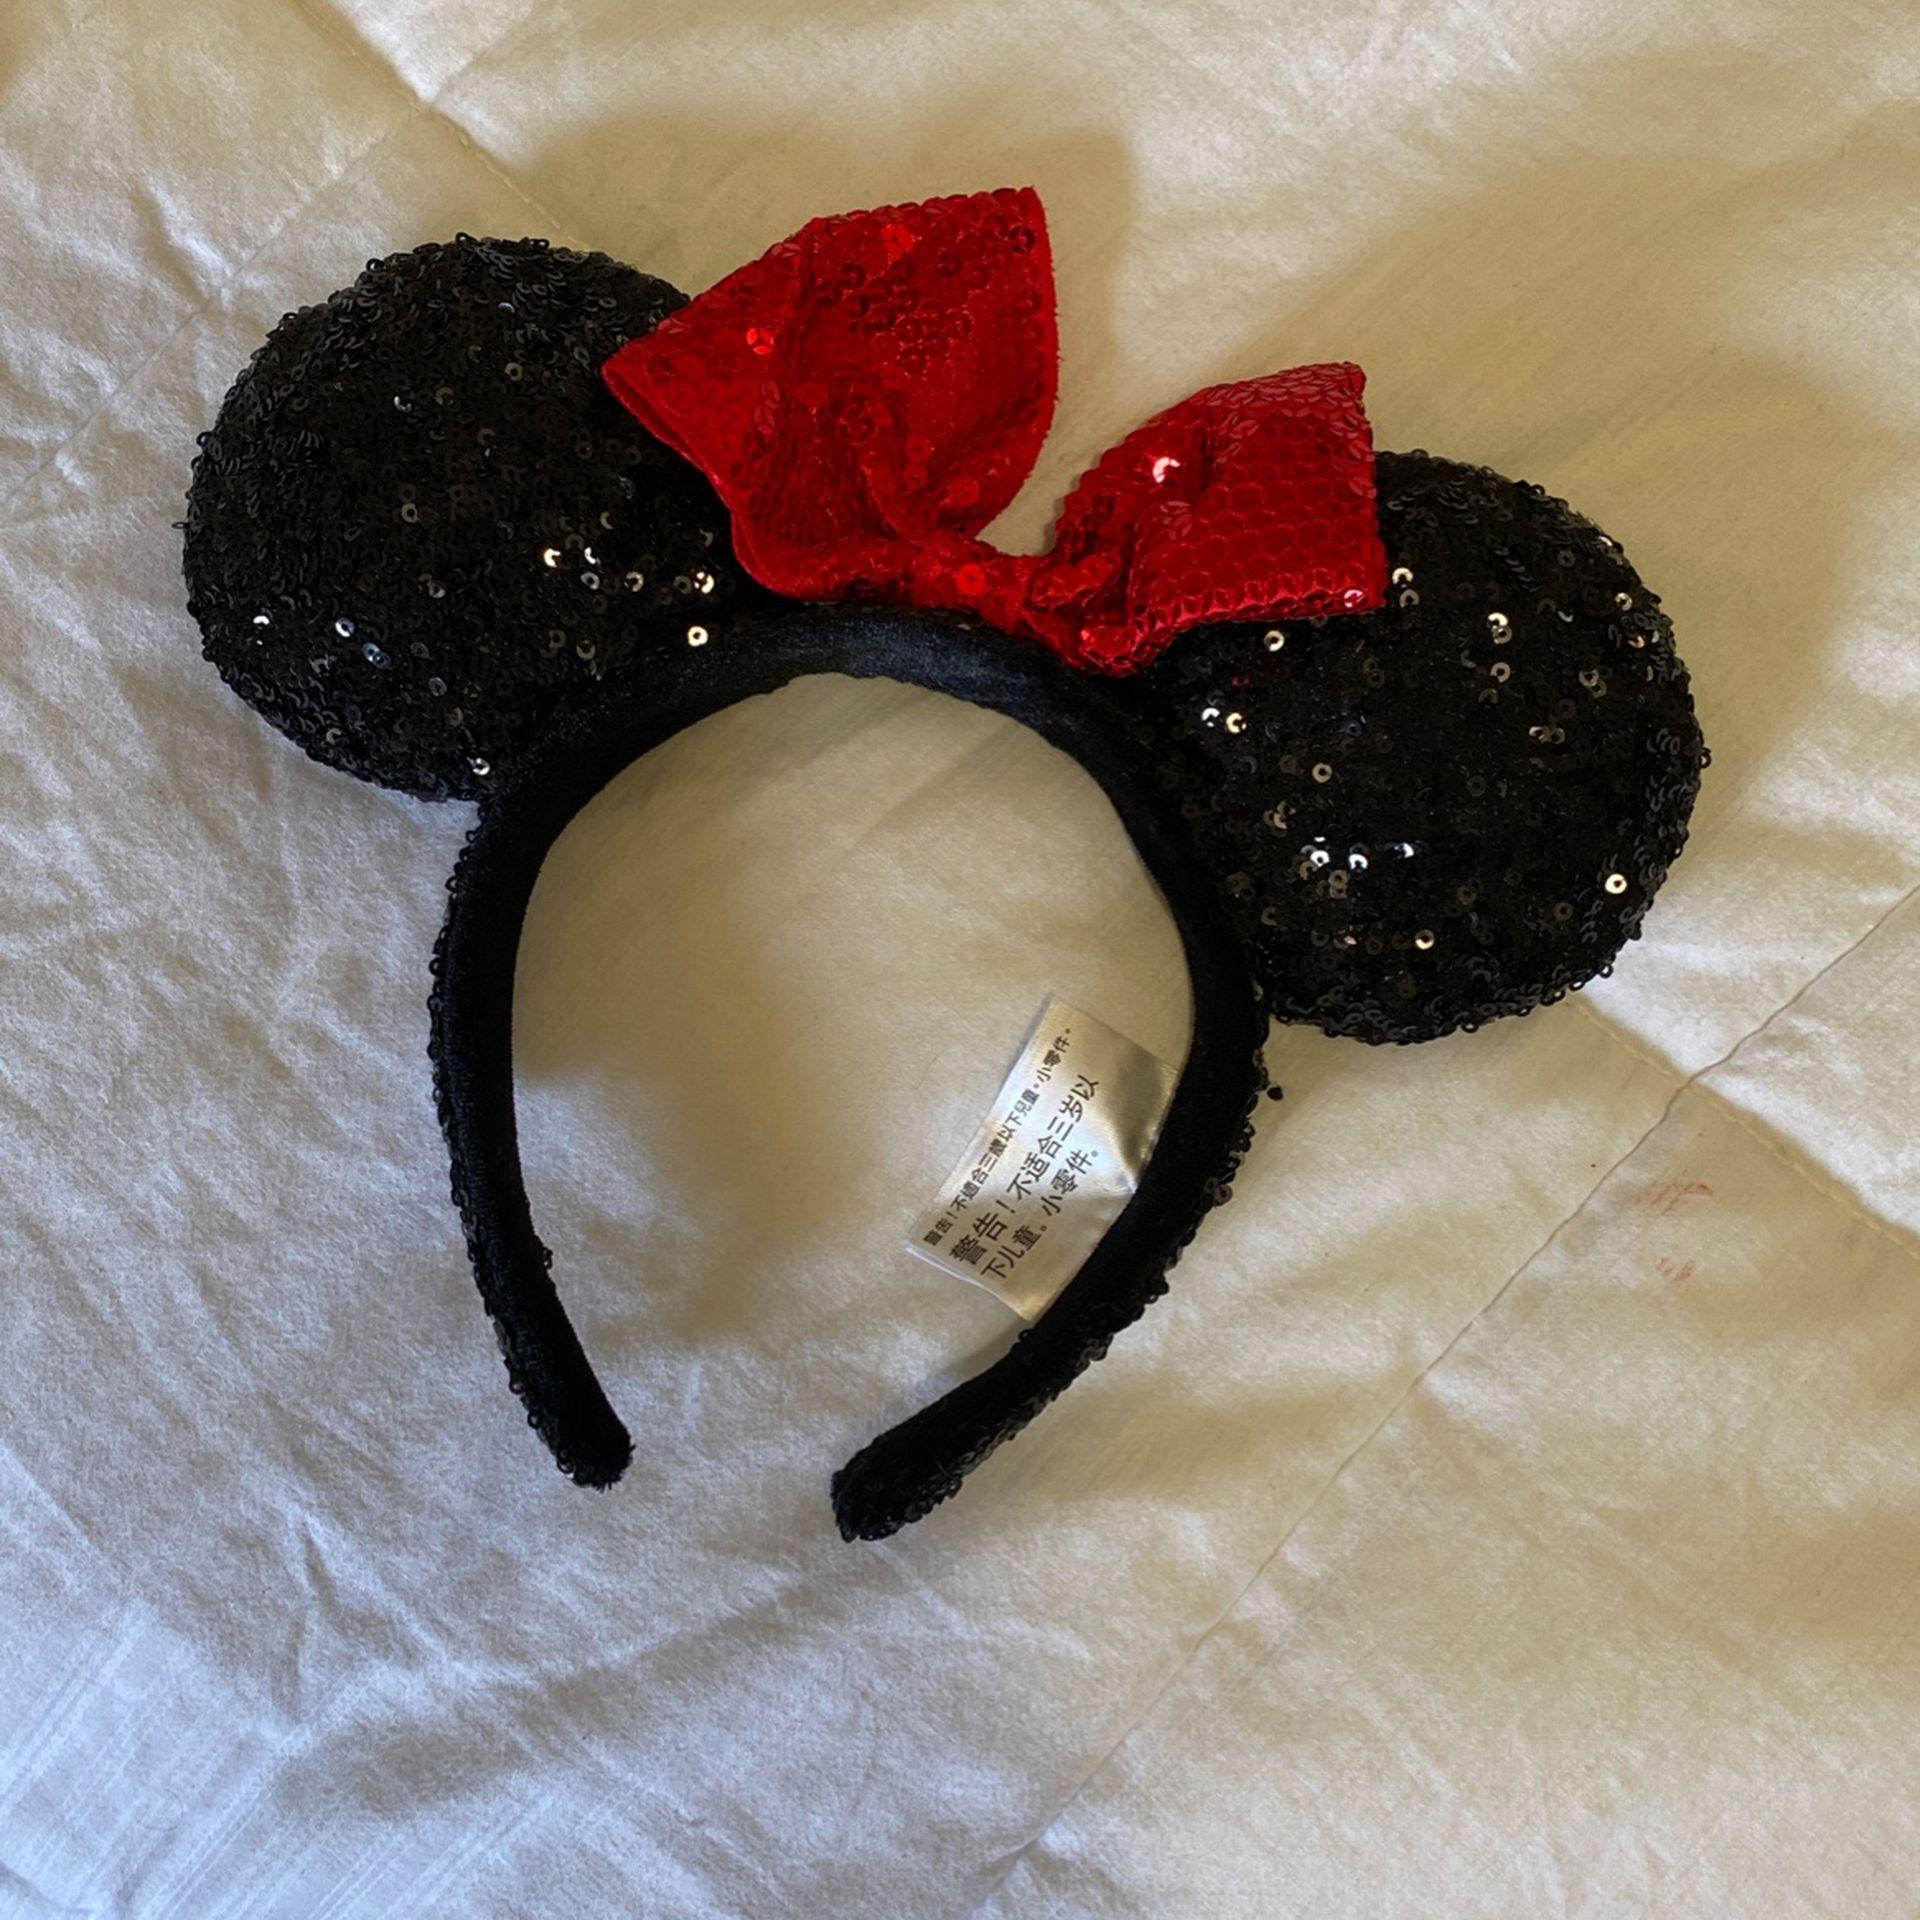 Disneyland Minnie Mouse Sequin Ear Headband